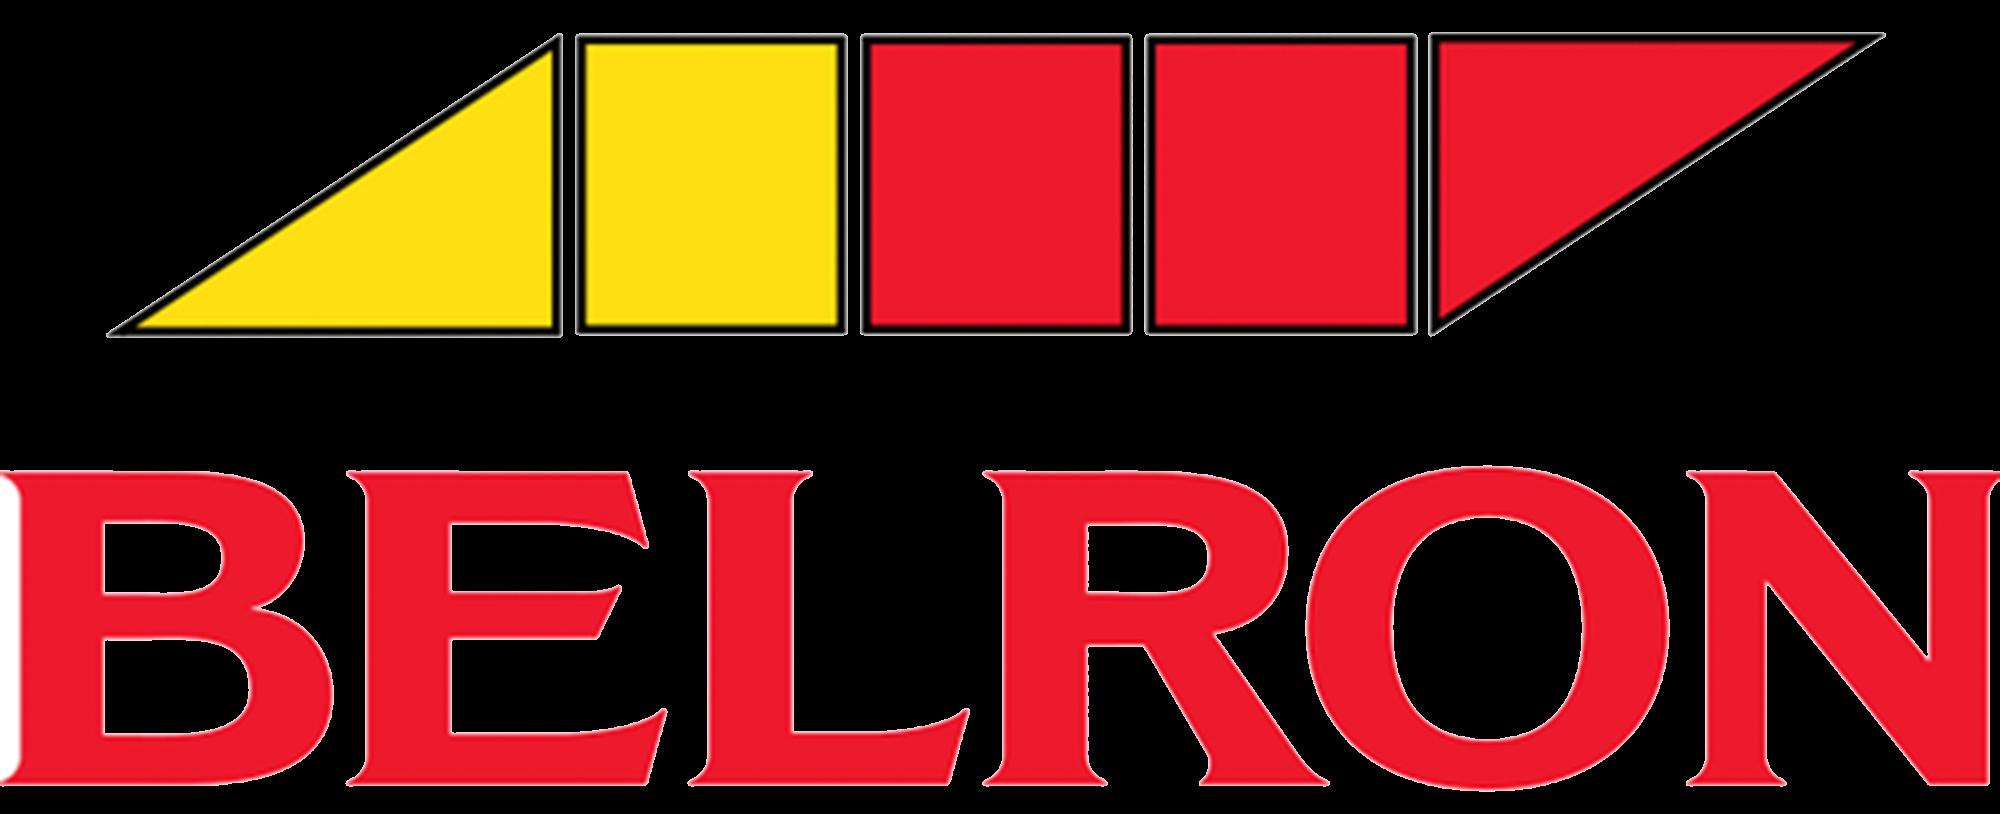 belron logo no background.png